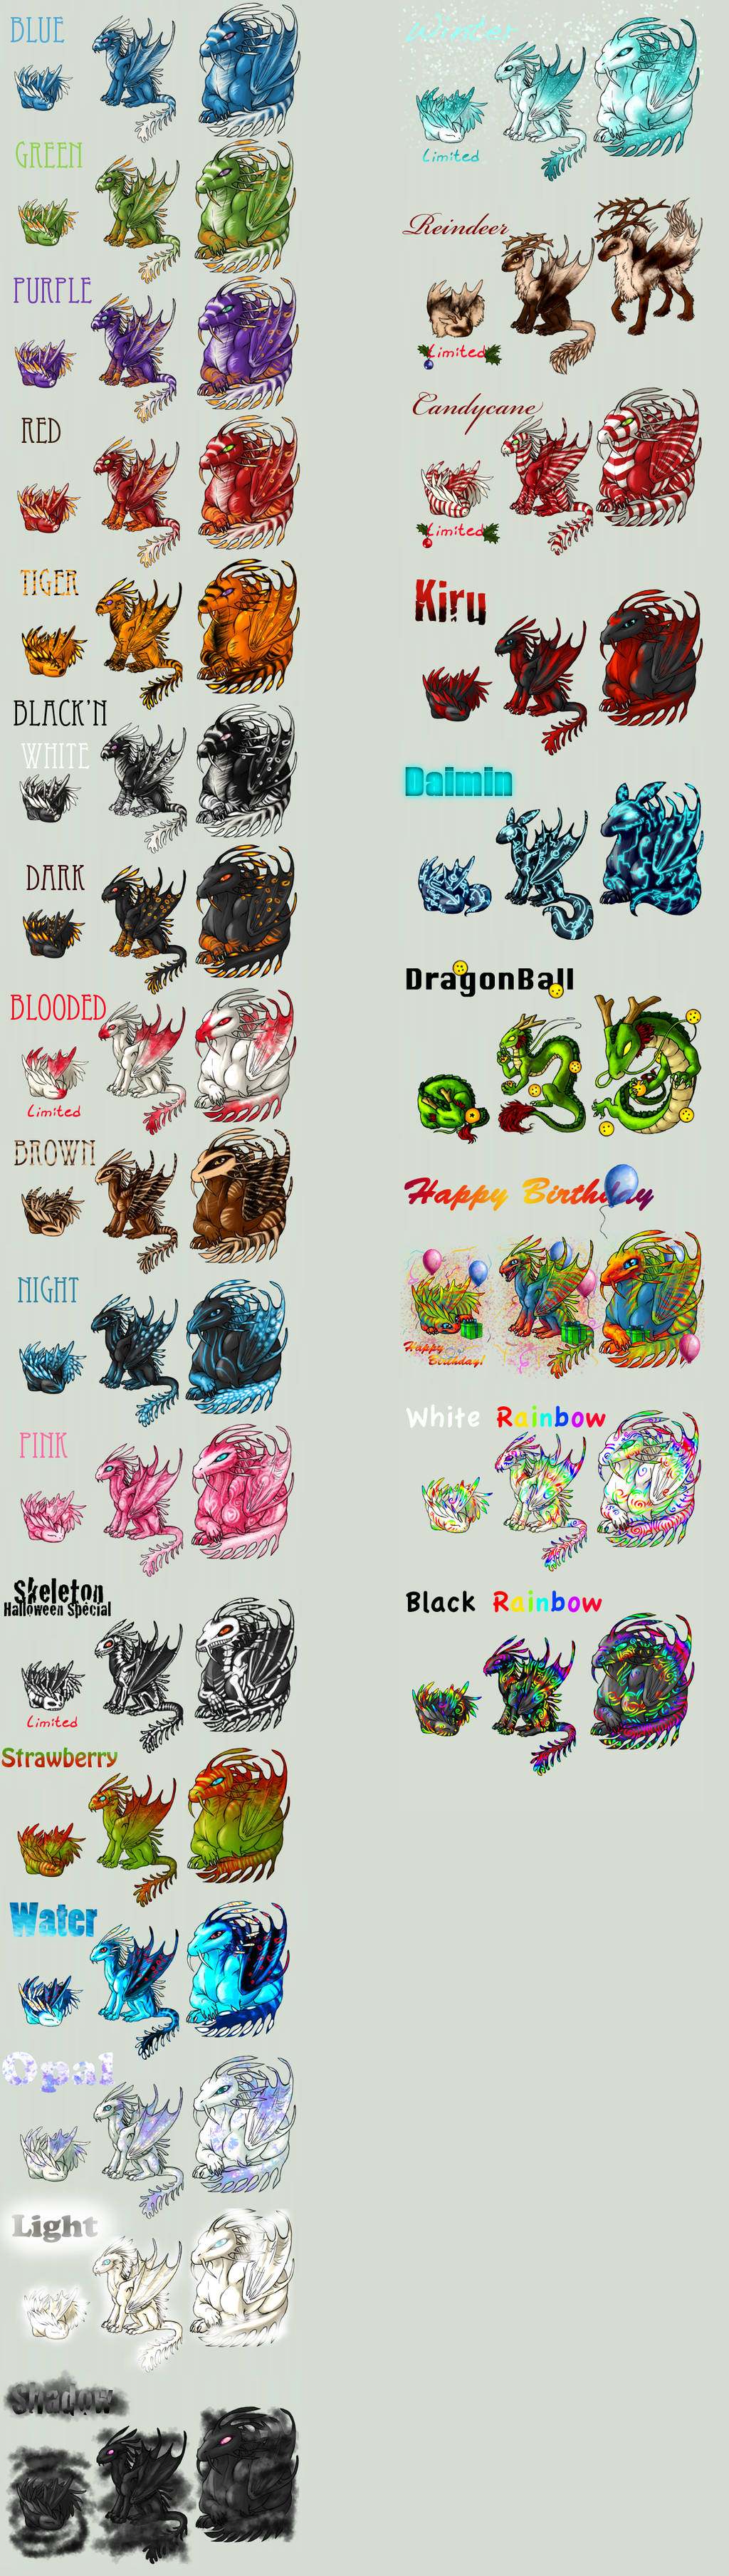 Adopt -Jungle Dragon- by elen89